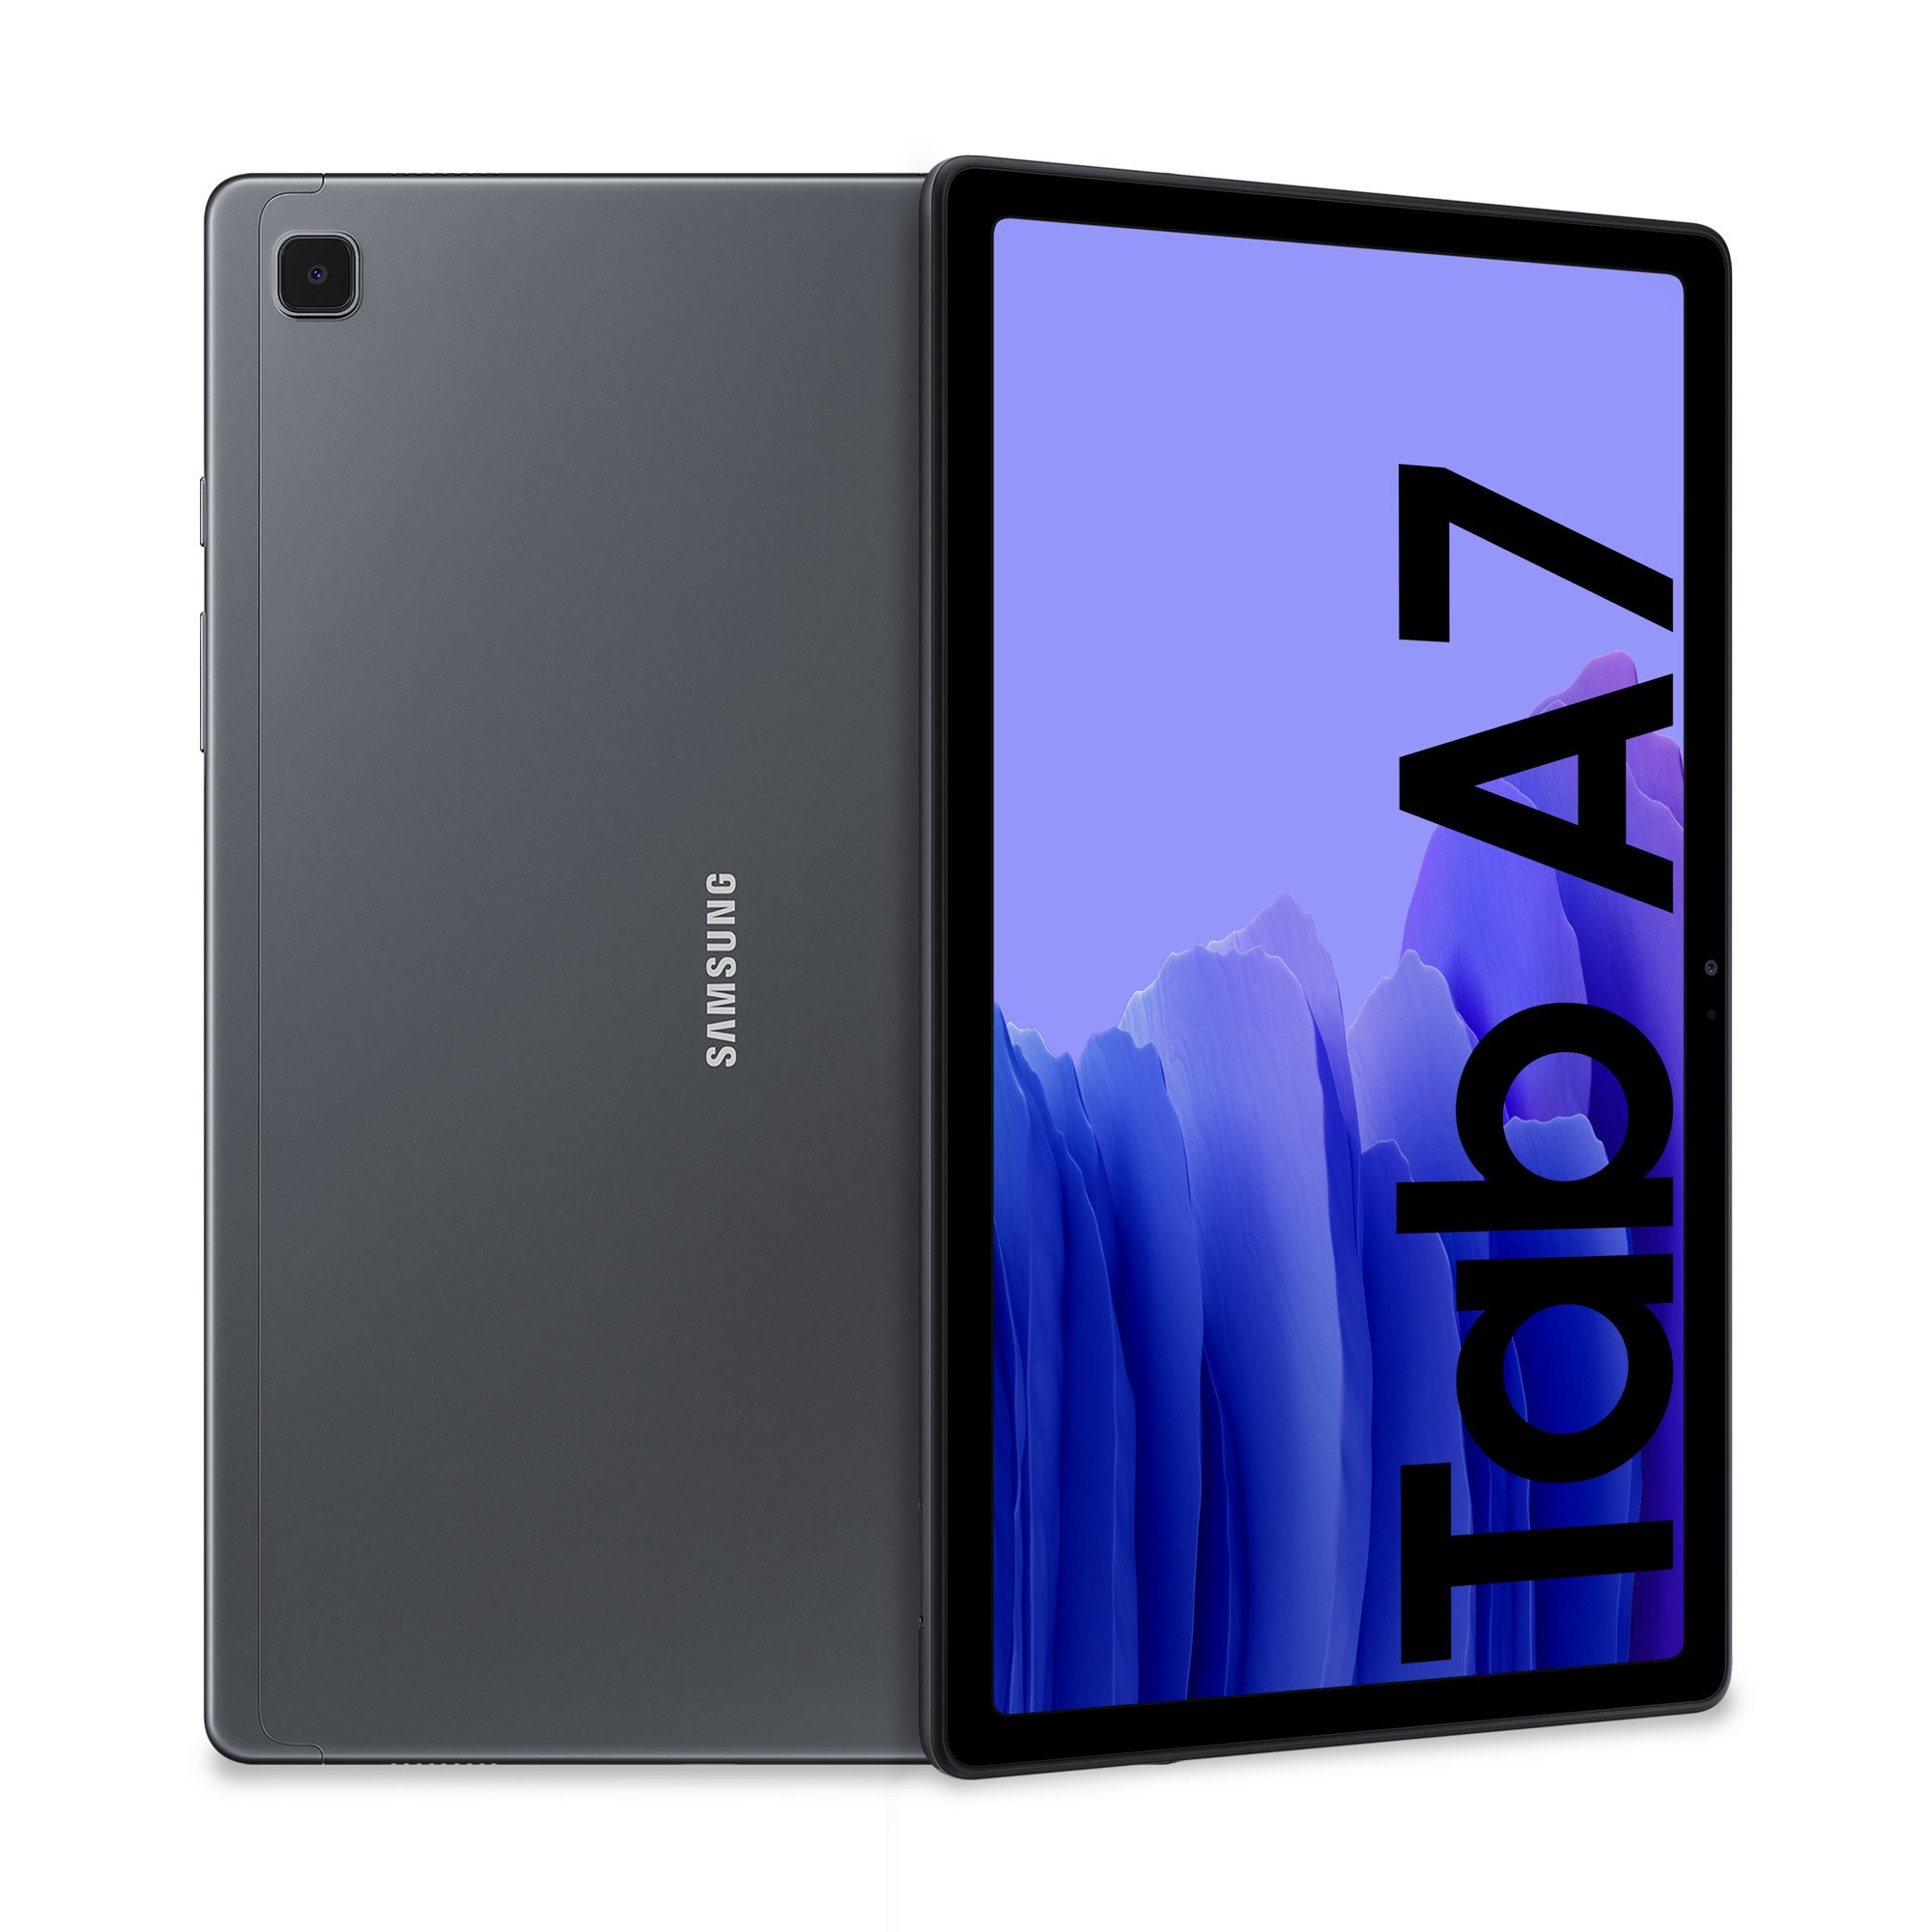 Tablet Copre 101 Carrefour